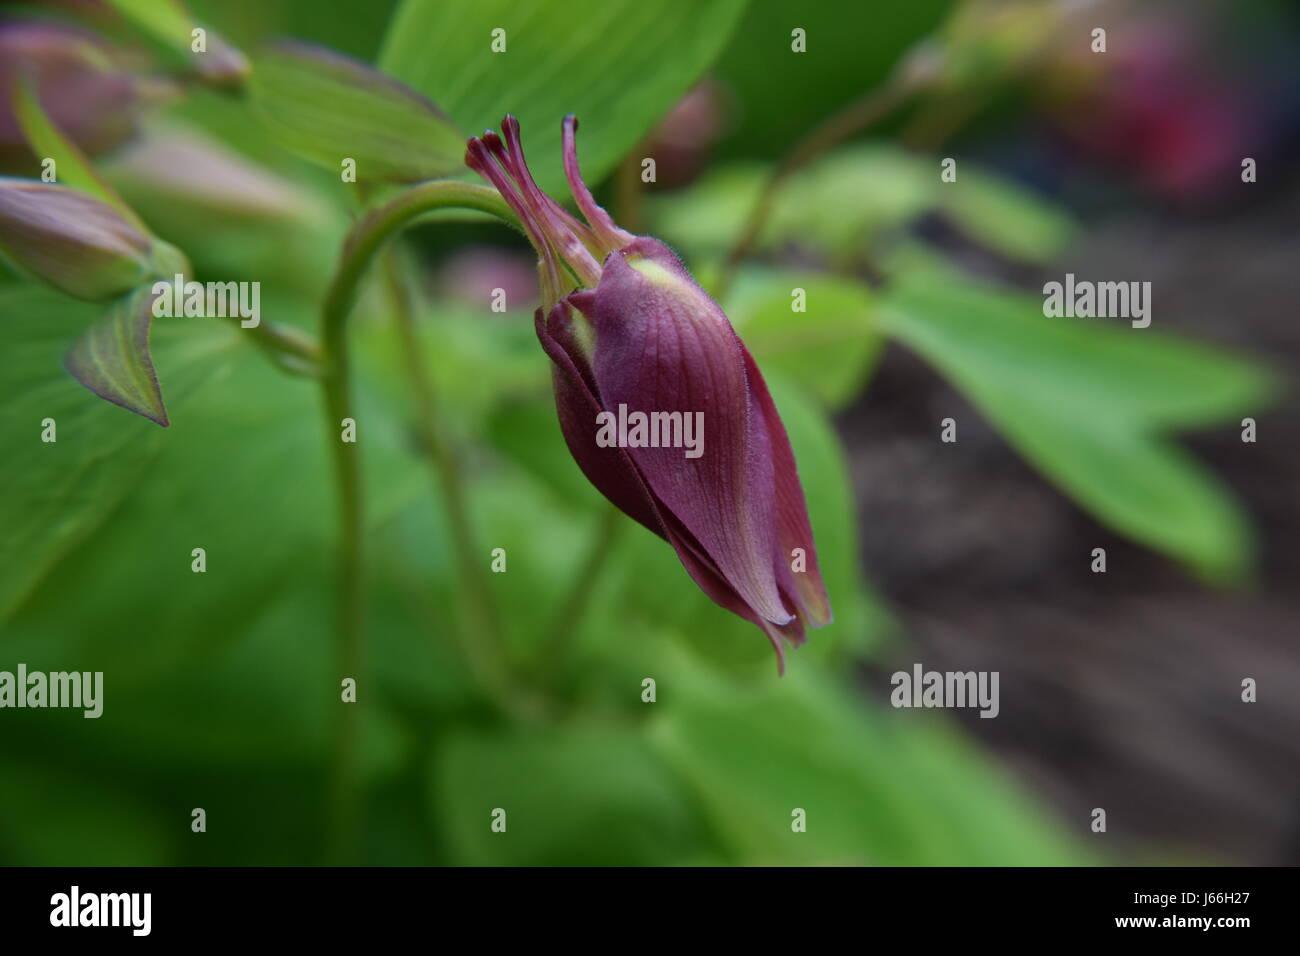 Songbird Cardinal Columbine Flower Bud - Stock Image